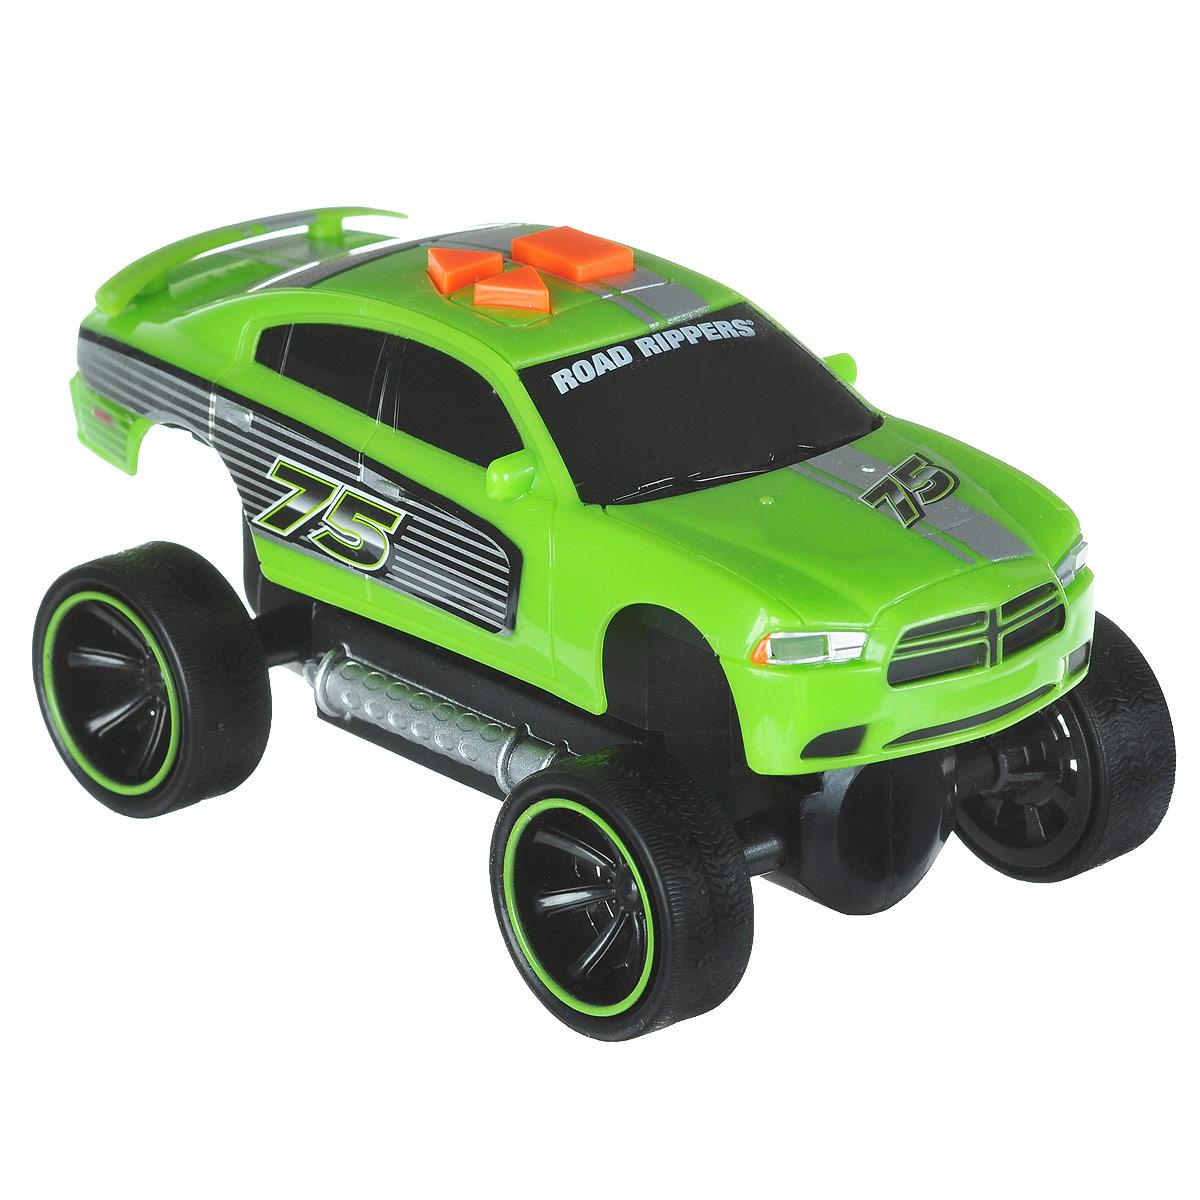 Машинка Road Rippers, цвет: салатовый. 33041TS33041TS_1